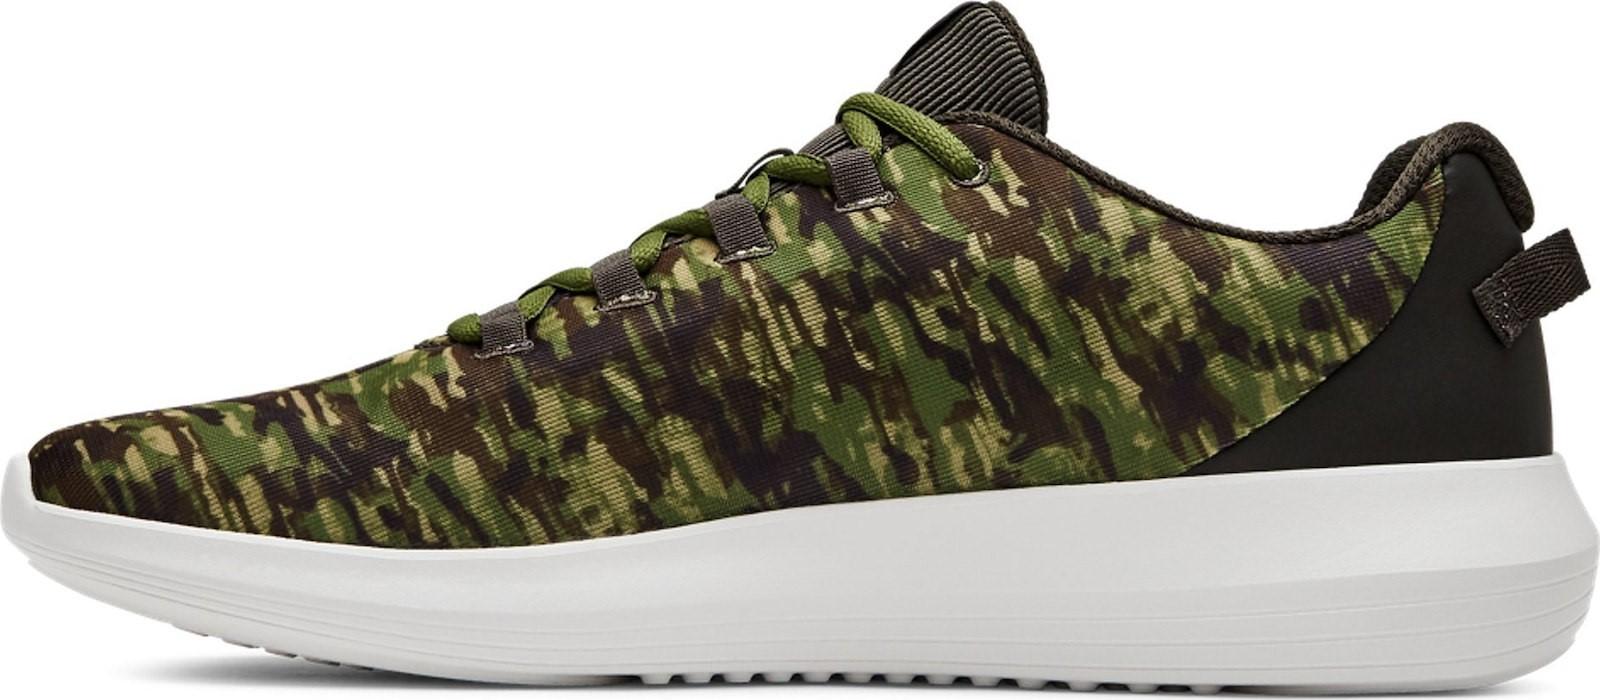 f4f5246d02ec7 Pánske bežecké topánky Under Armour Ripple NM Print 100 10 (EUR 44 ...